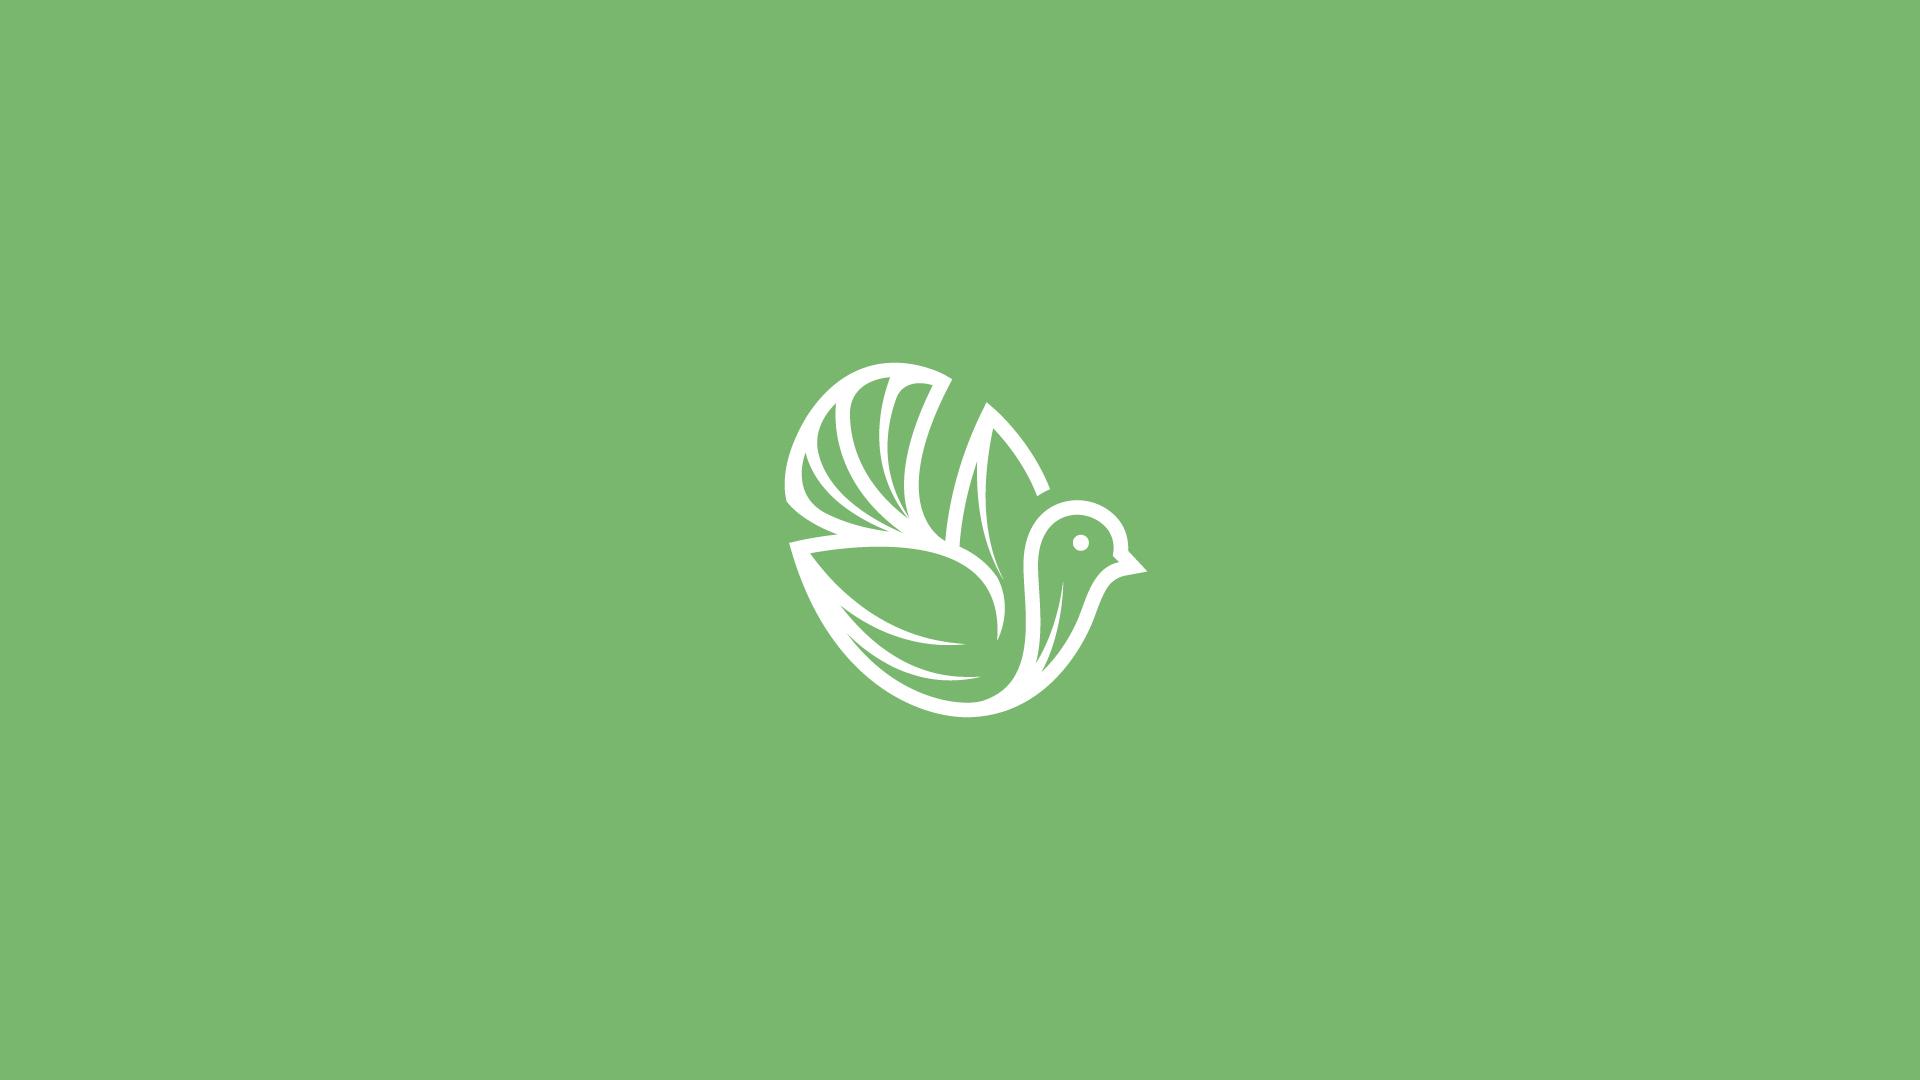 Bird-logo-farm-and-coffee